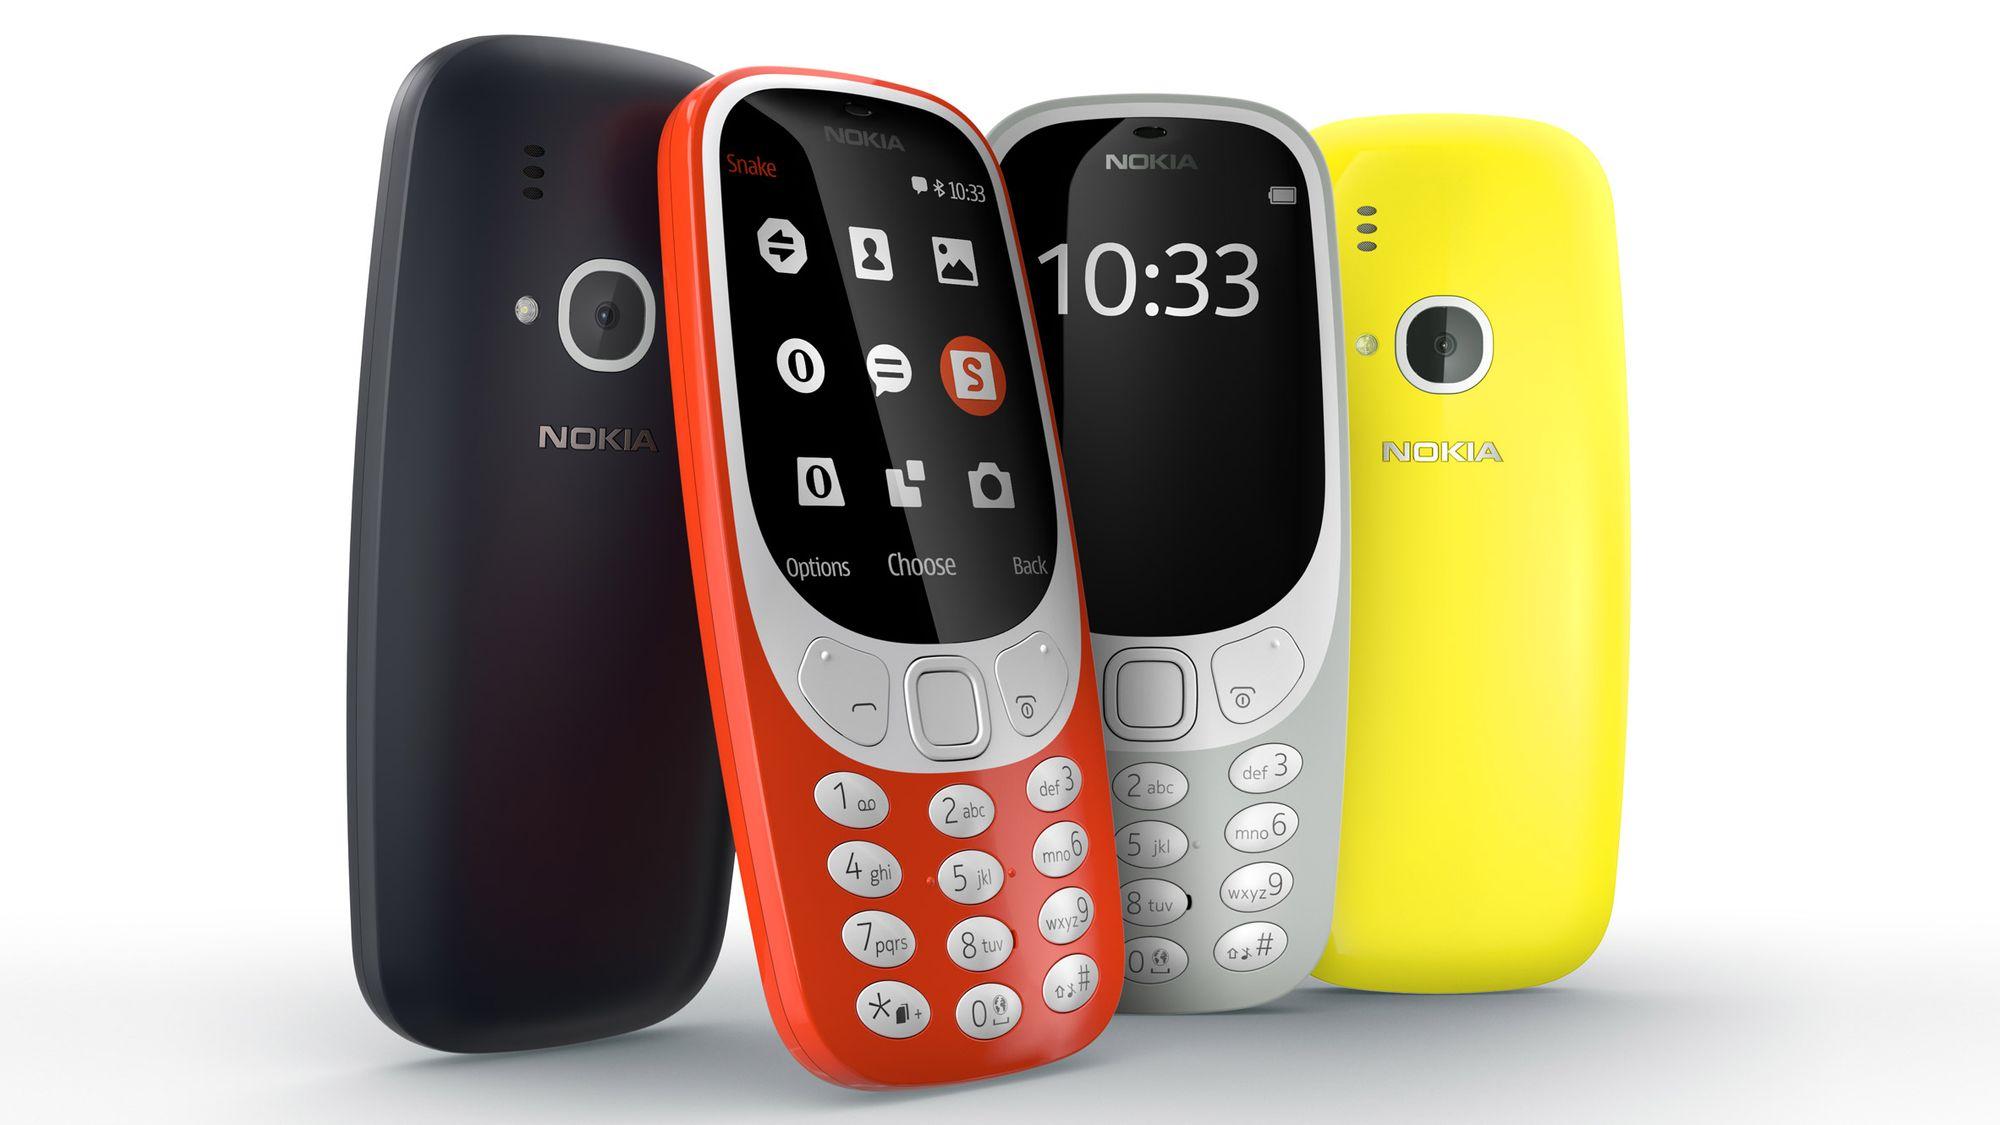 Nokia's New Dumbphone Dominates Headlines + The Kalenga Conundrum